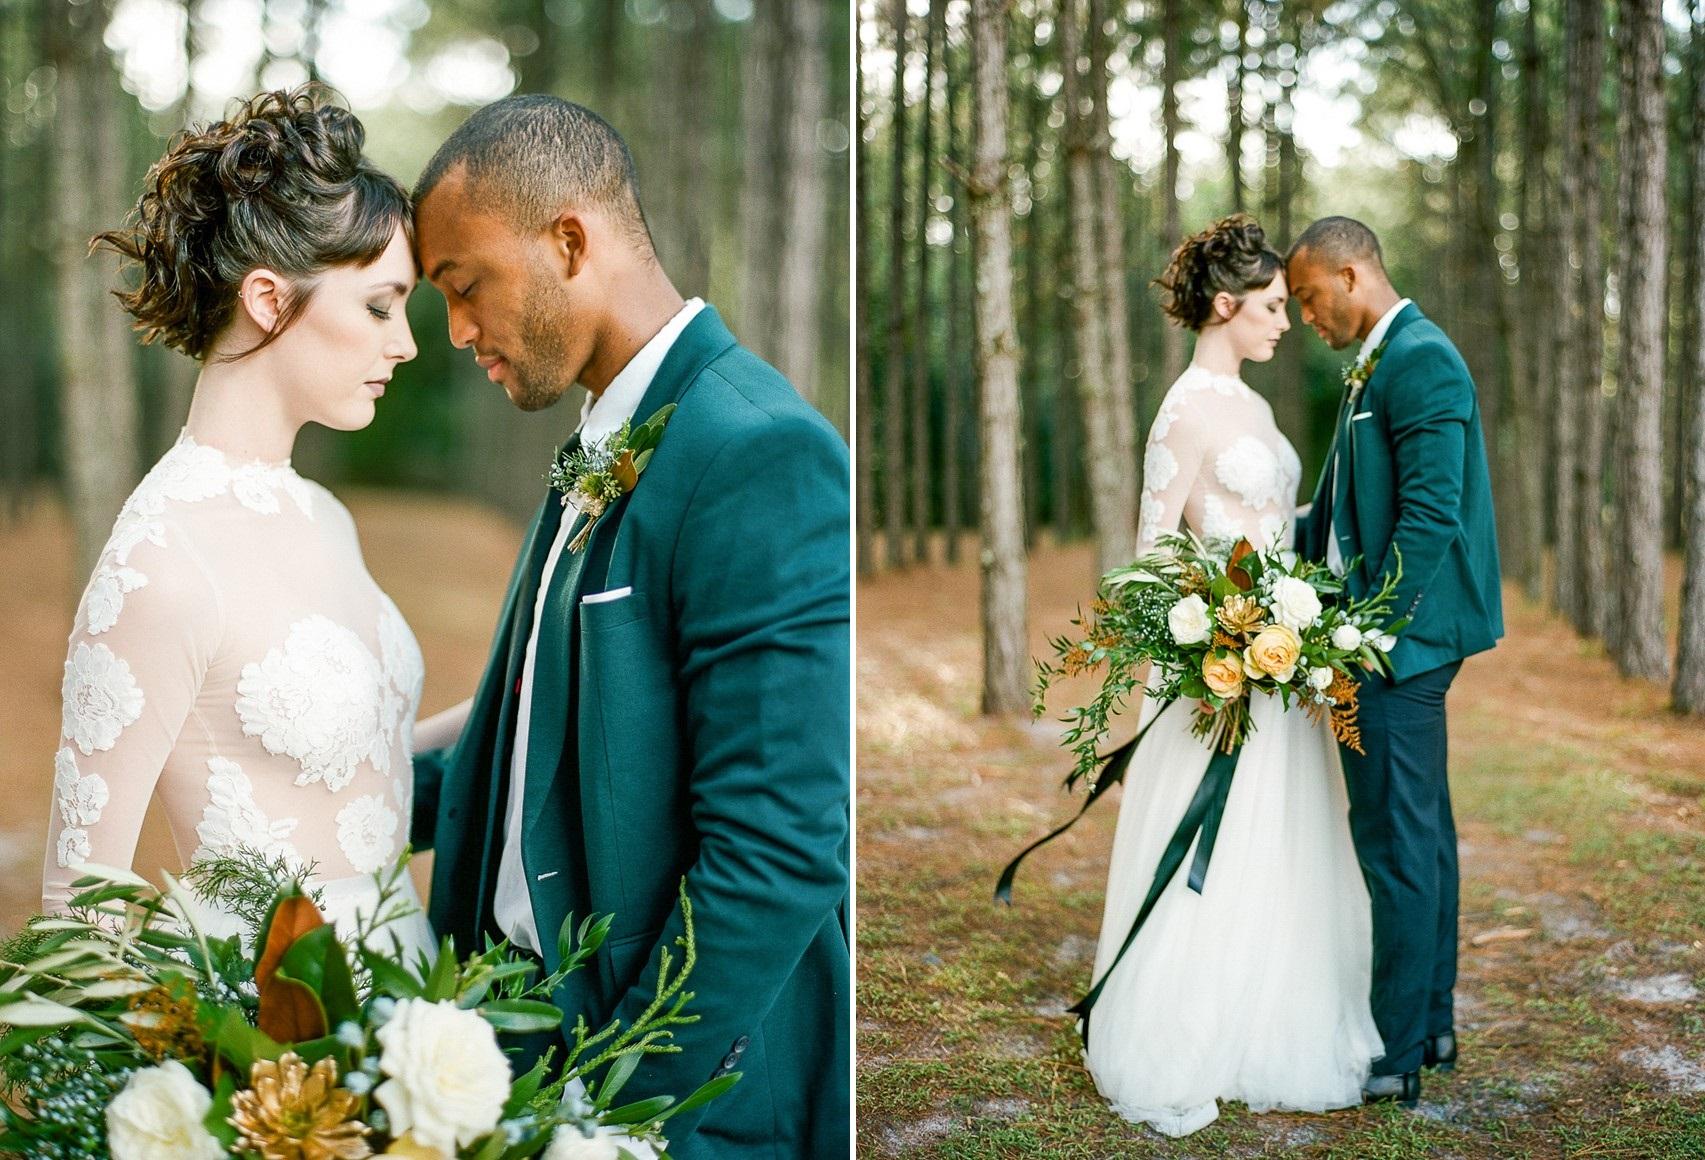 Emerald Green and Gold Woodland Wedding Inspiration